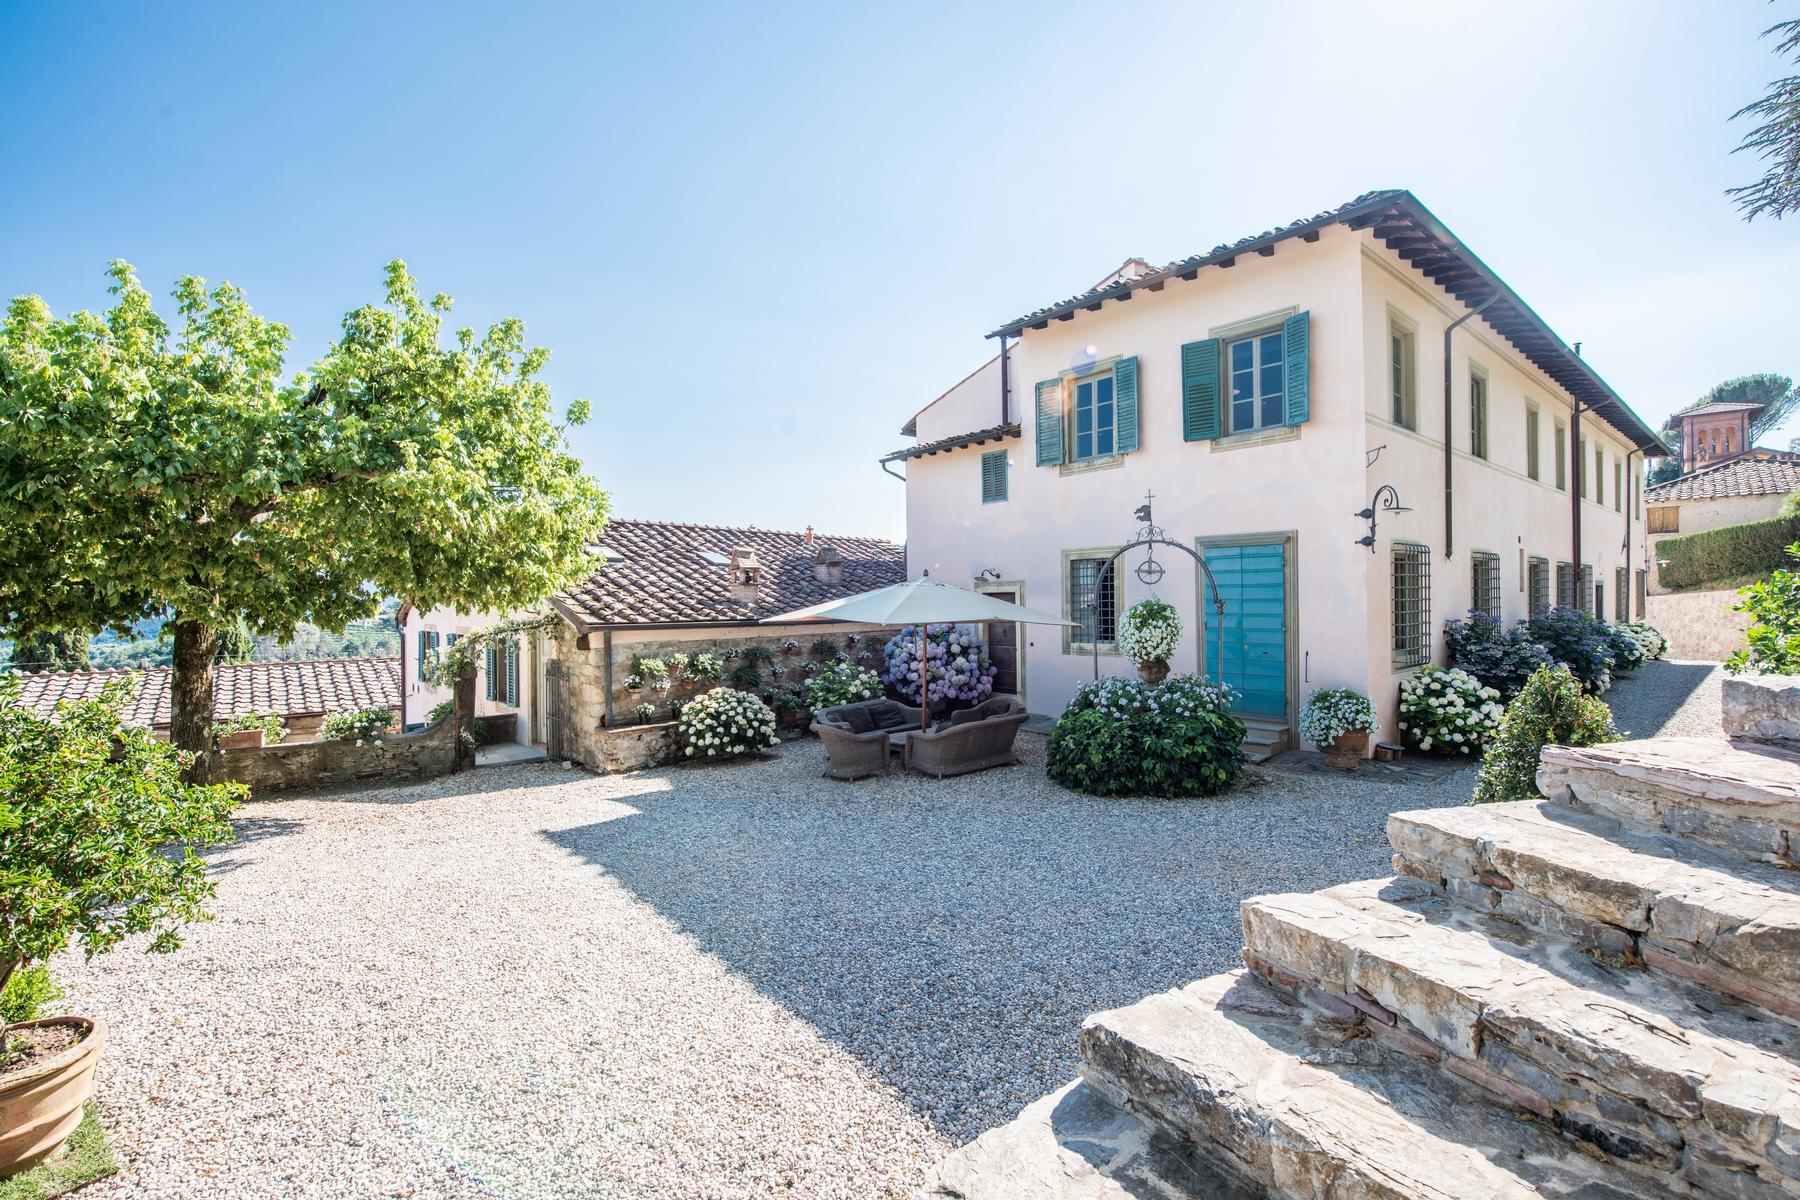 Villa in Vendita a Lucca: 5 locali, 2500 mq - Foto 19